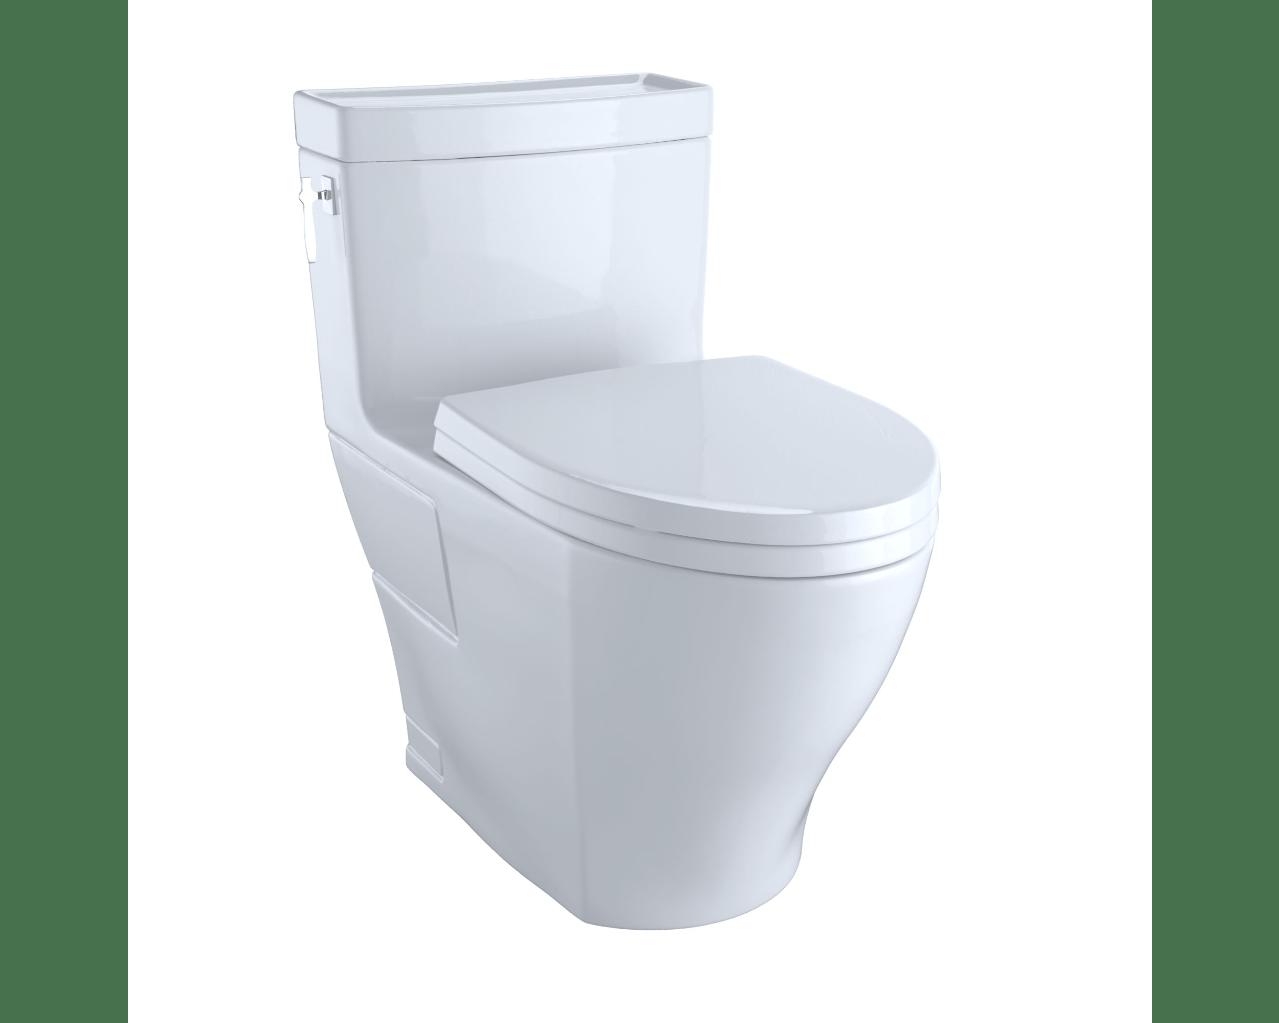 Toto SW3046T40#01 WASHLET+ S500e Elongated Bidet Toilet Seat with ...